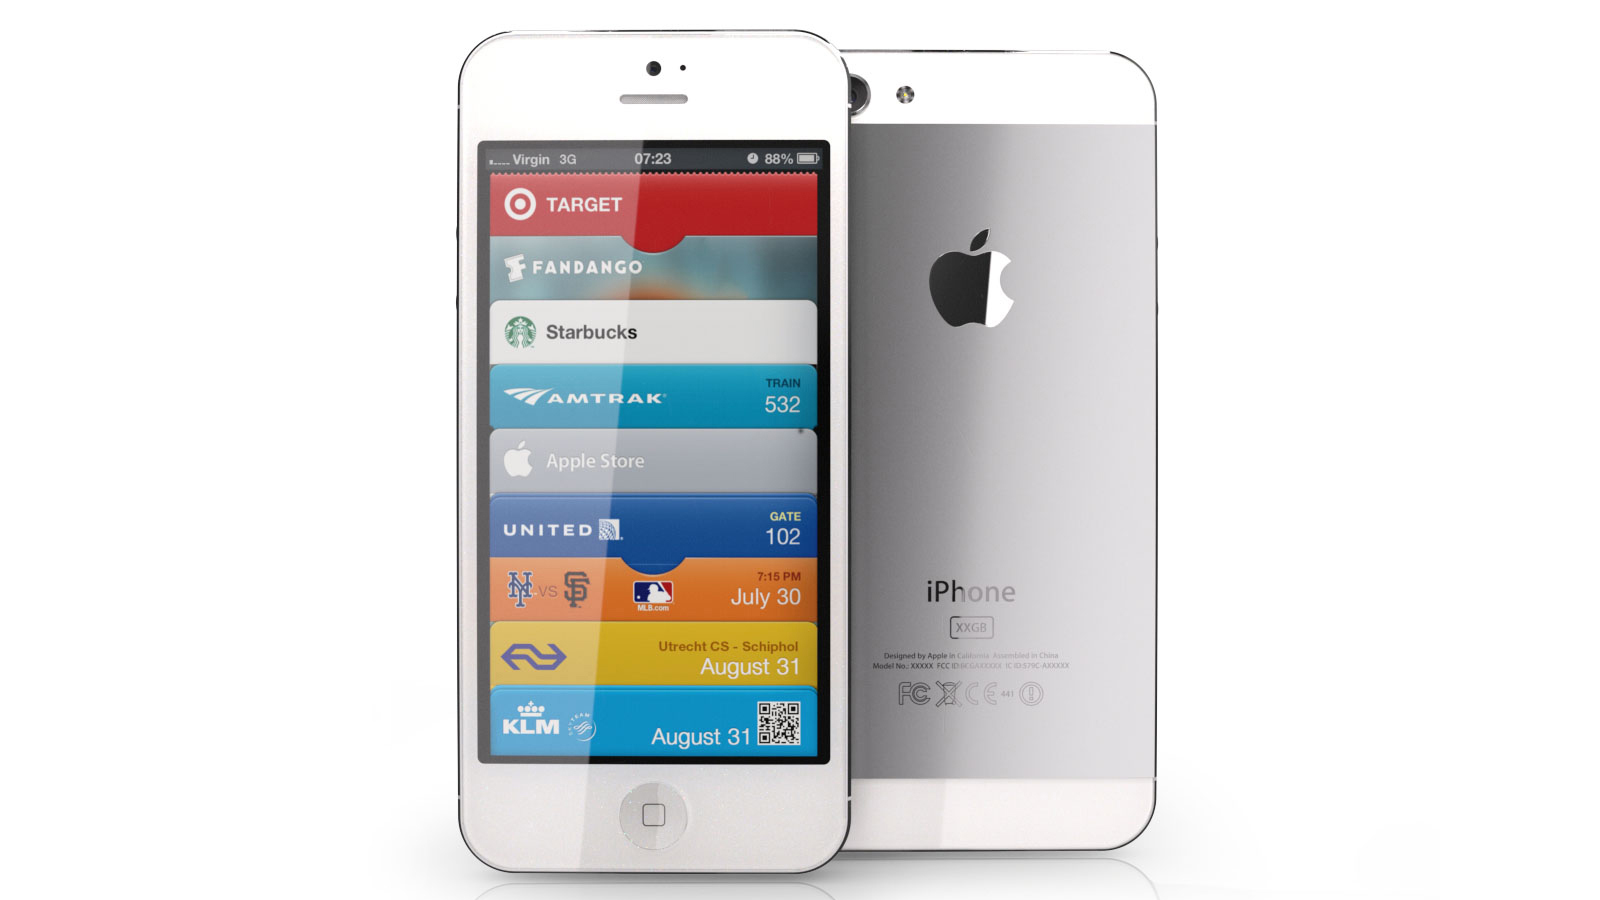 Mockup do novo iPhone